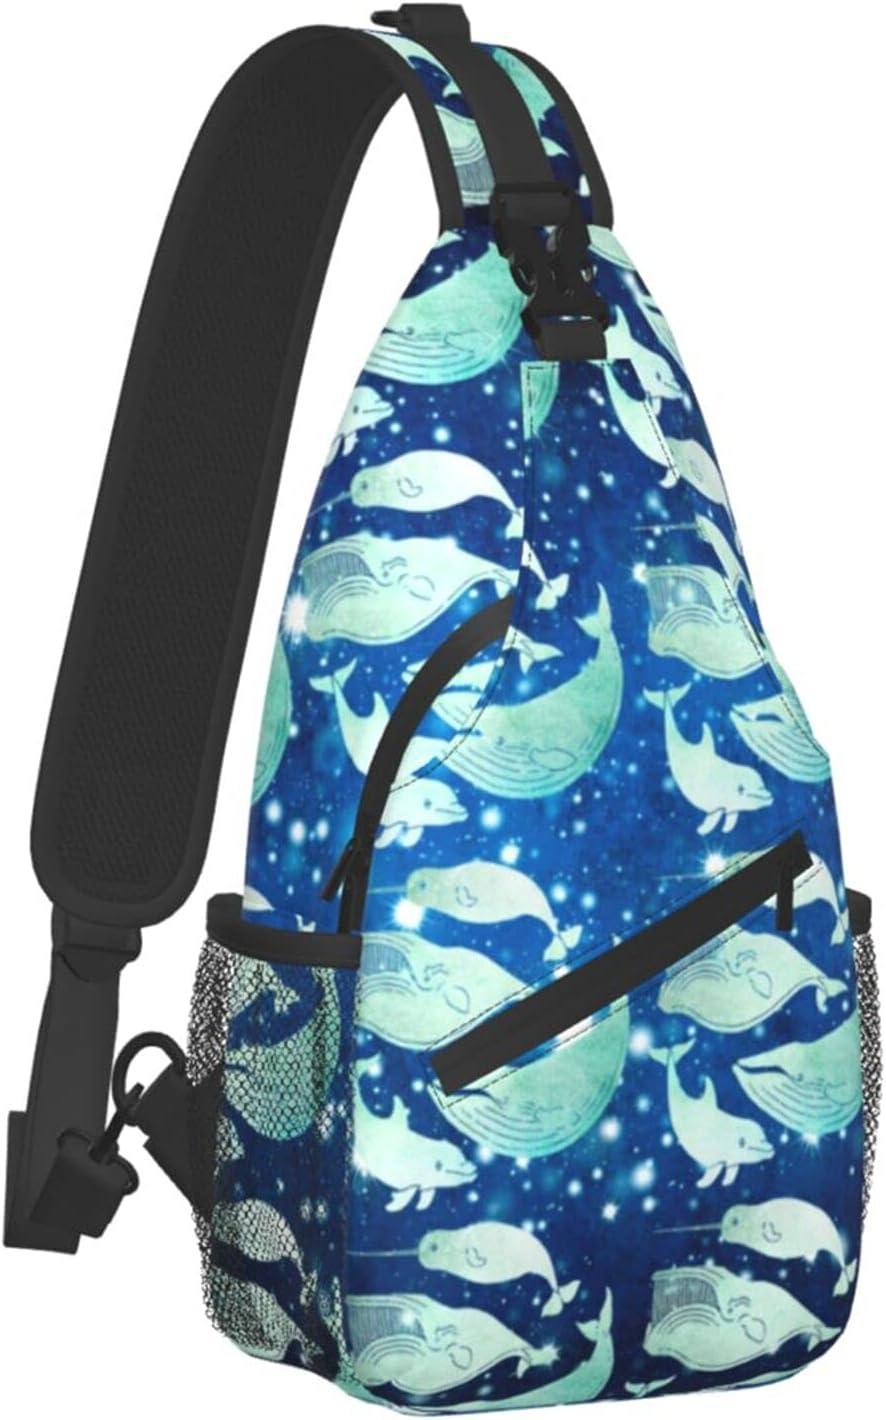 Sling Backpack Travel Hiking Daypack 70% OFF Outlet Dolphin Narwhal Be super welcome Blu Vintage